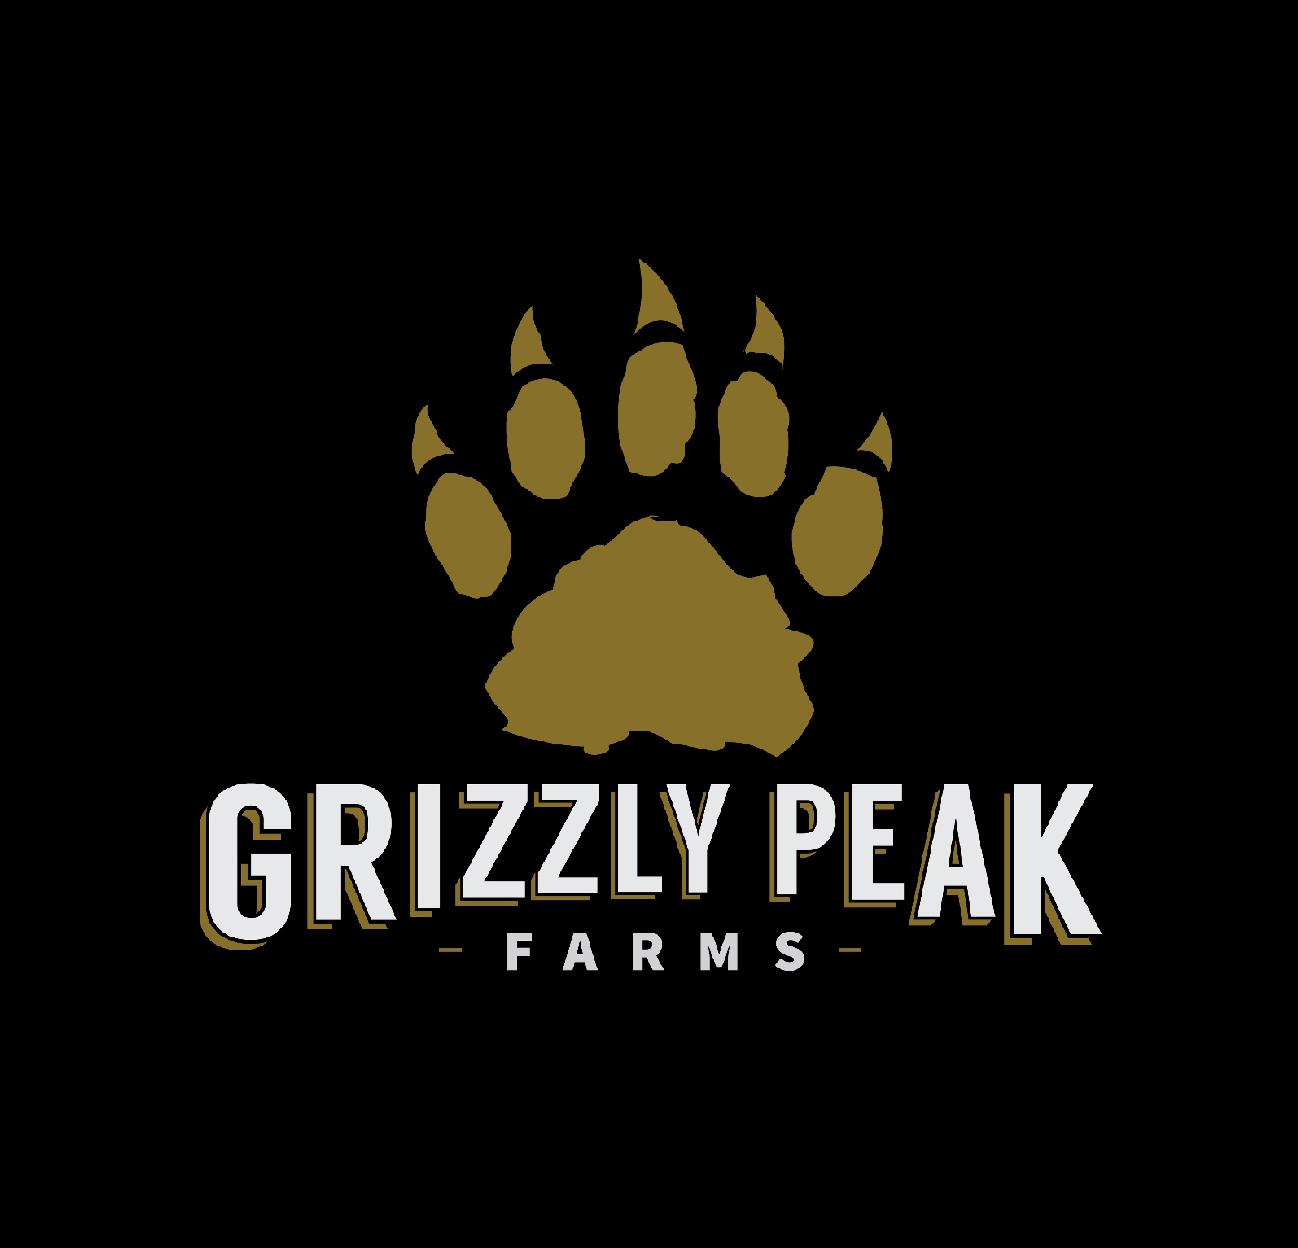 Grizzly Peak Farms